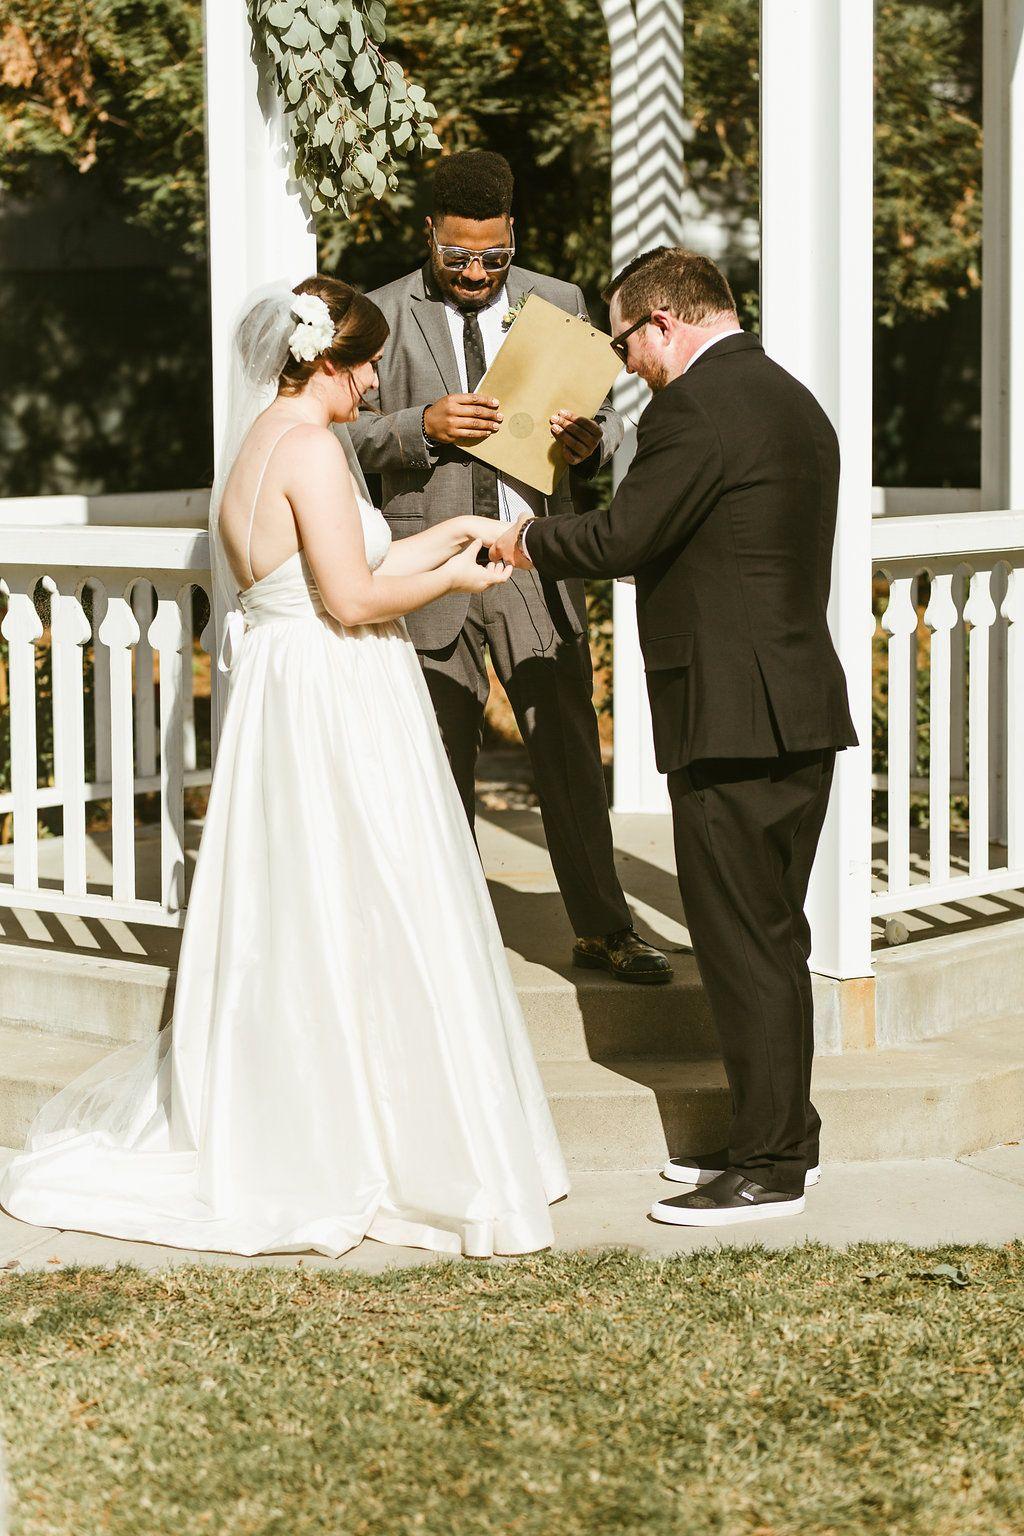 Jack House and Gardens Wedding | Black tux, Garden weddings and ...